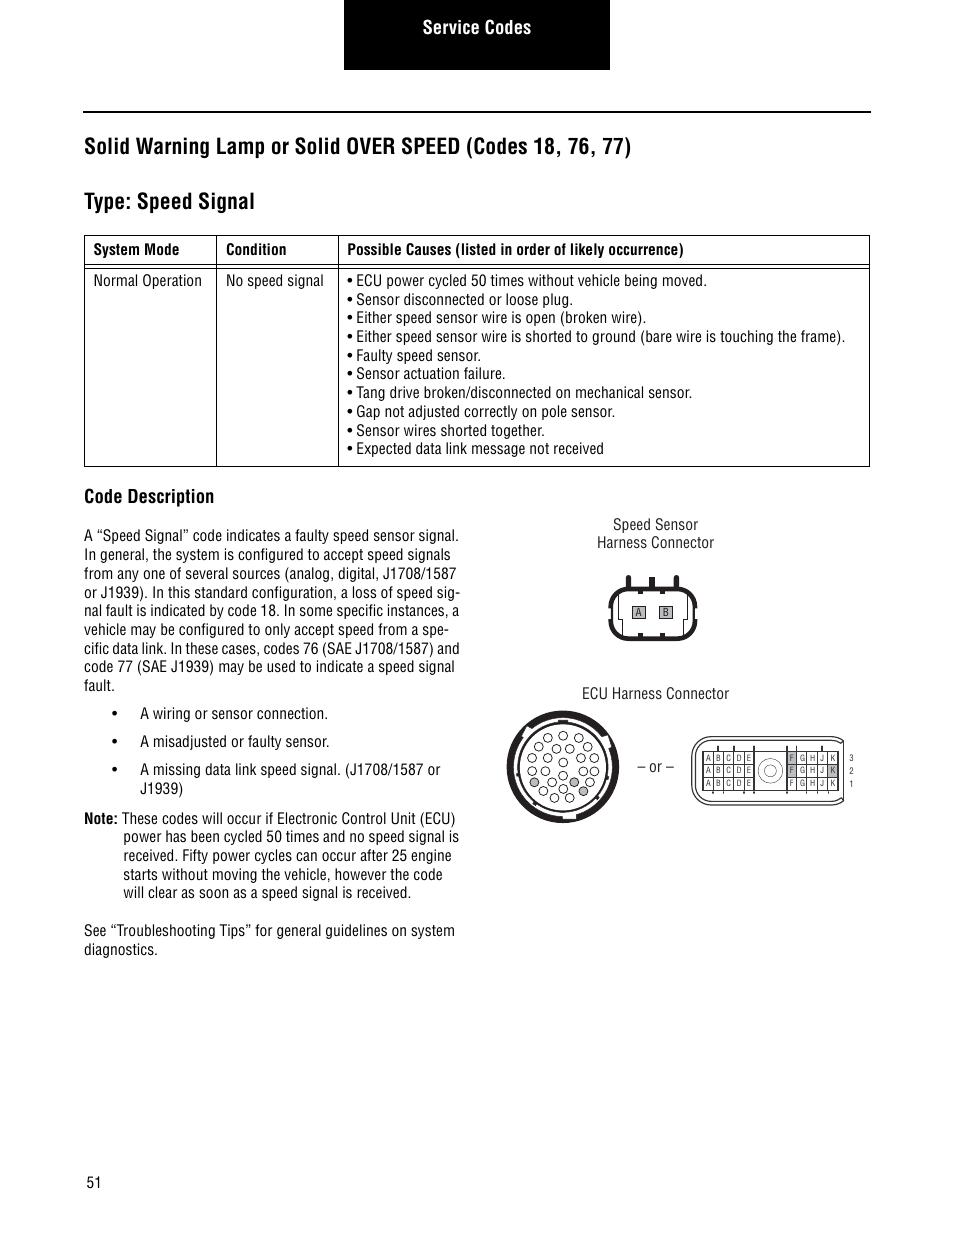 service codes code description speed sensor harness connector rh manualsdir com ECU Unit ECU Parts Thermo King